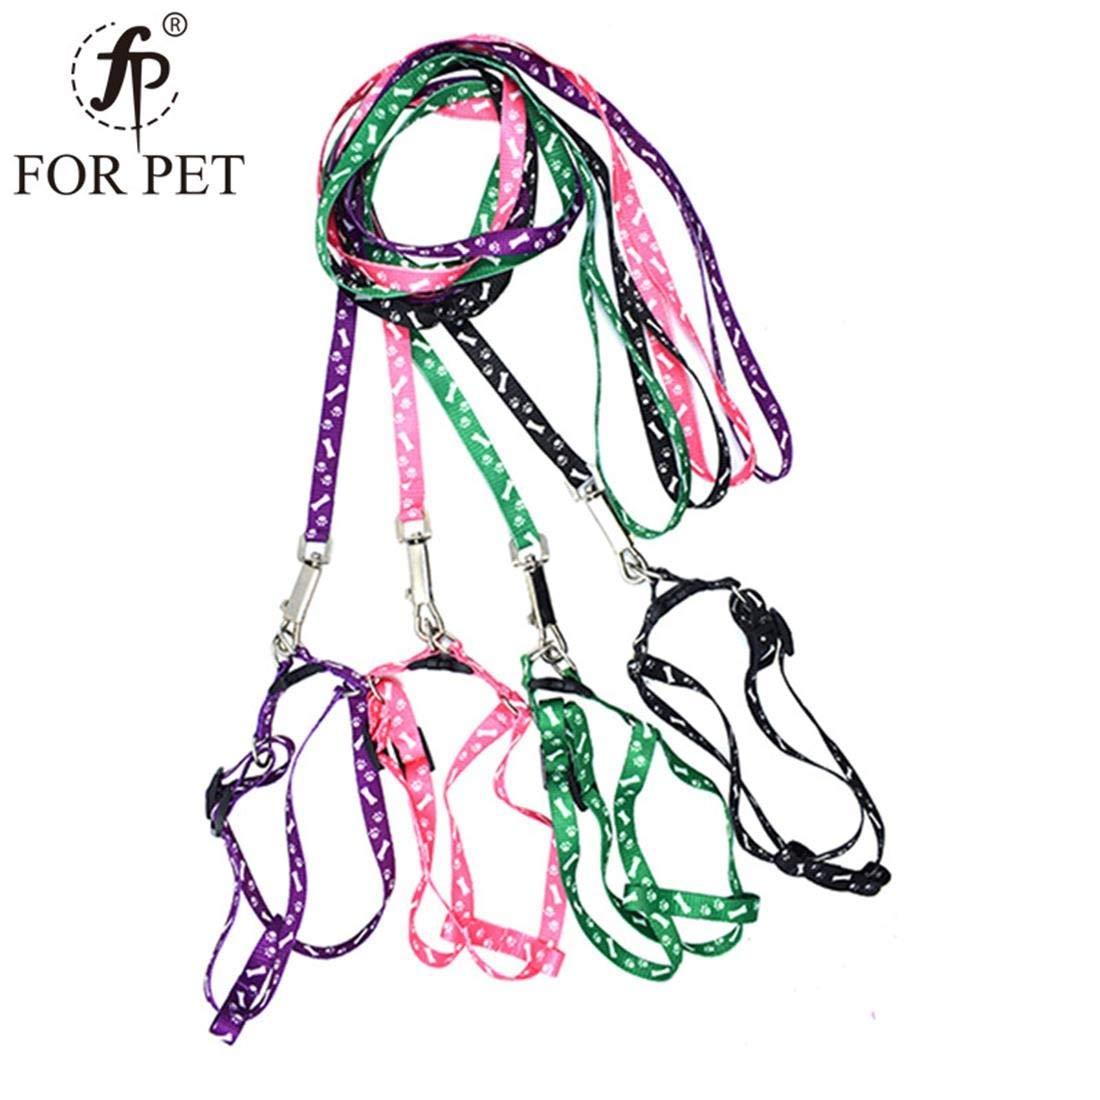 Random color 1.5120cm Random color 1.5120cm MISSKERVINFENDRIYUN 1.5cm Wide Printed Chest Back Traction Rope Dog Chest Back Traction Belt Cat Rope Pet Supplies (Random colors) (color   Random color, Size   1.5  120cm)